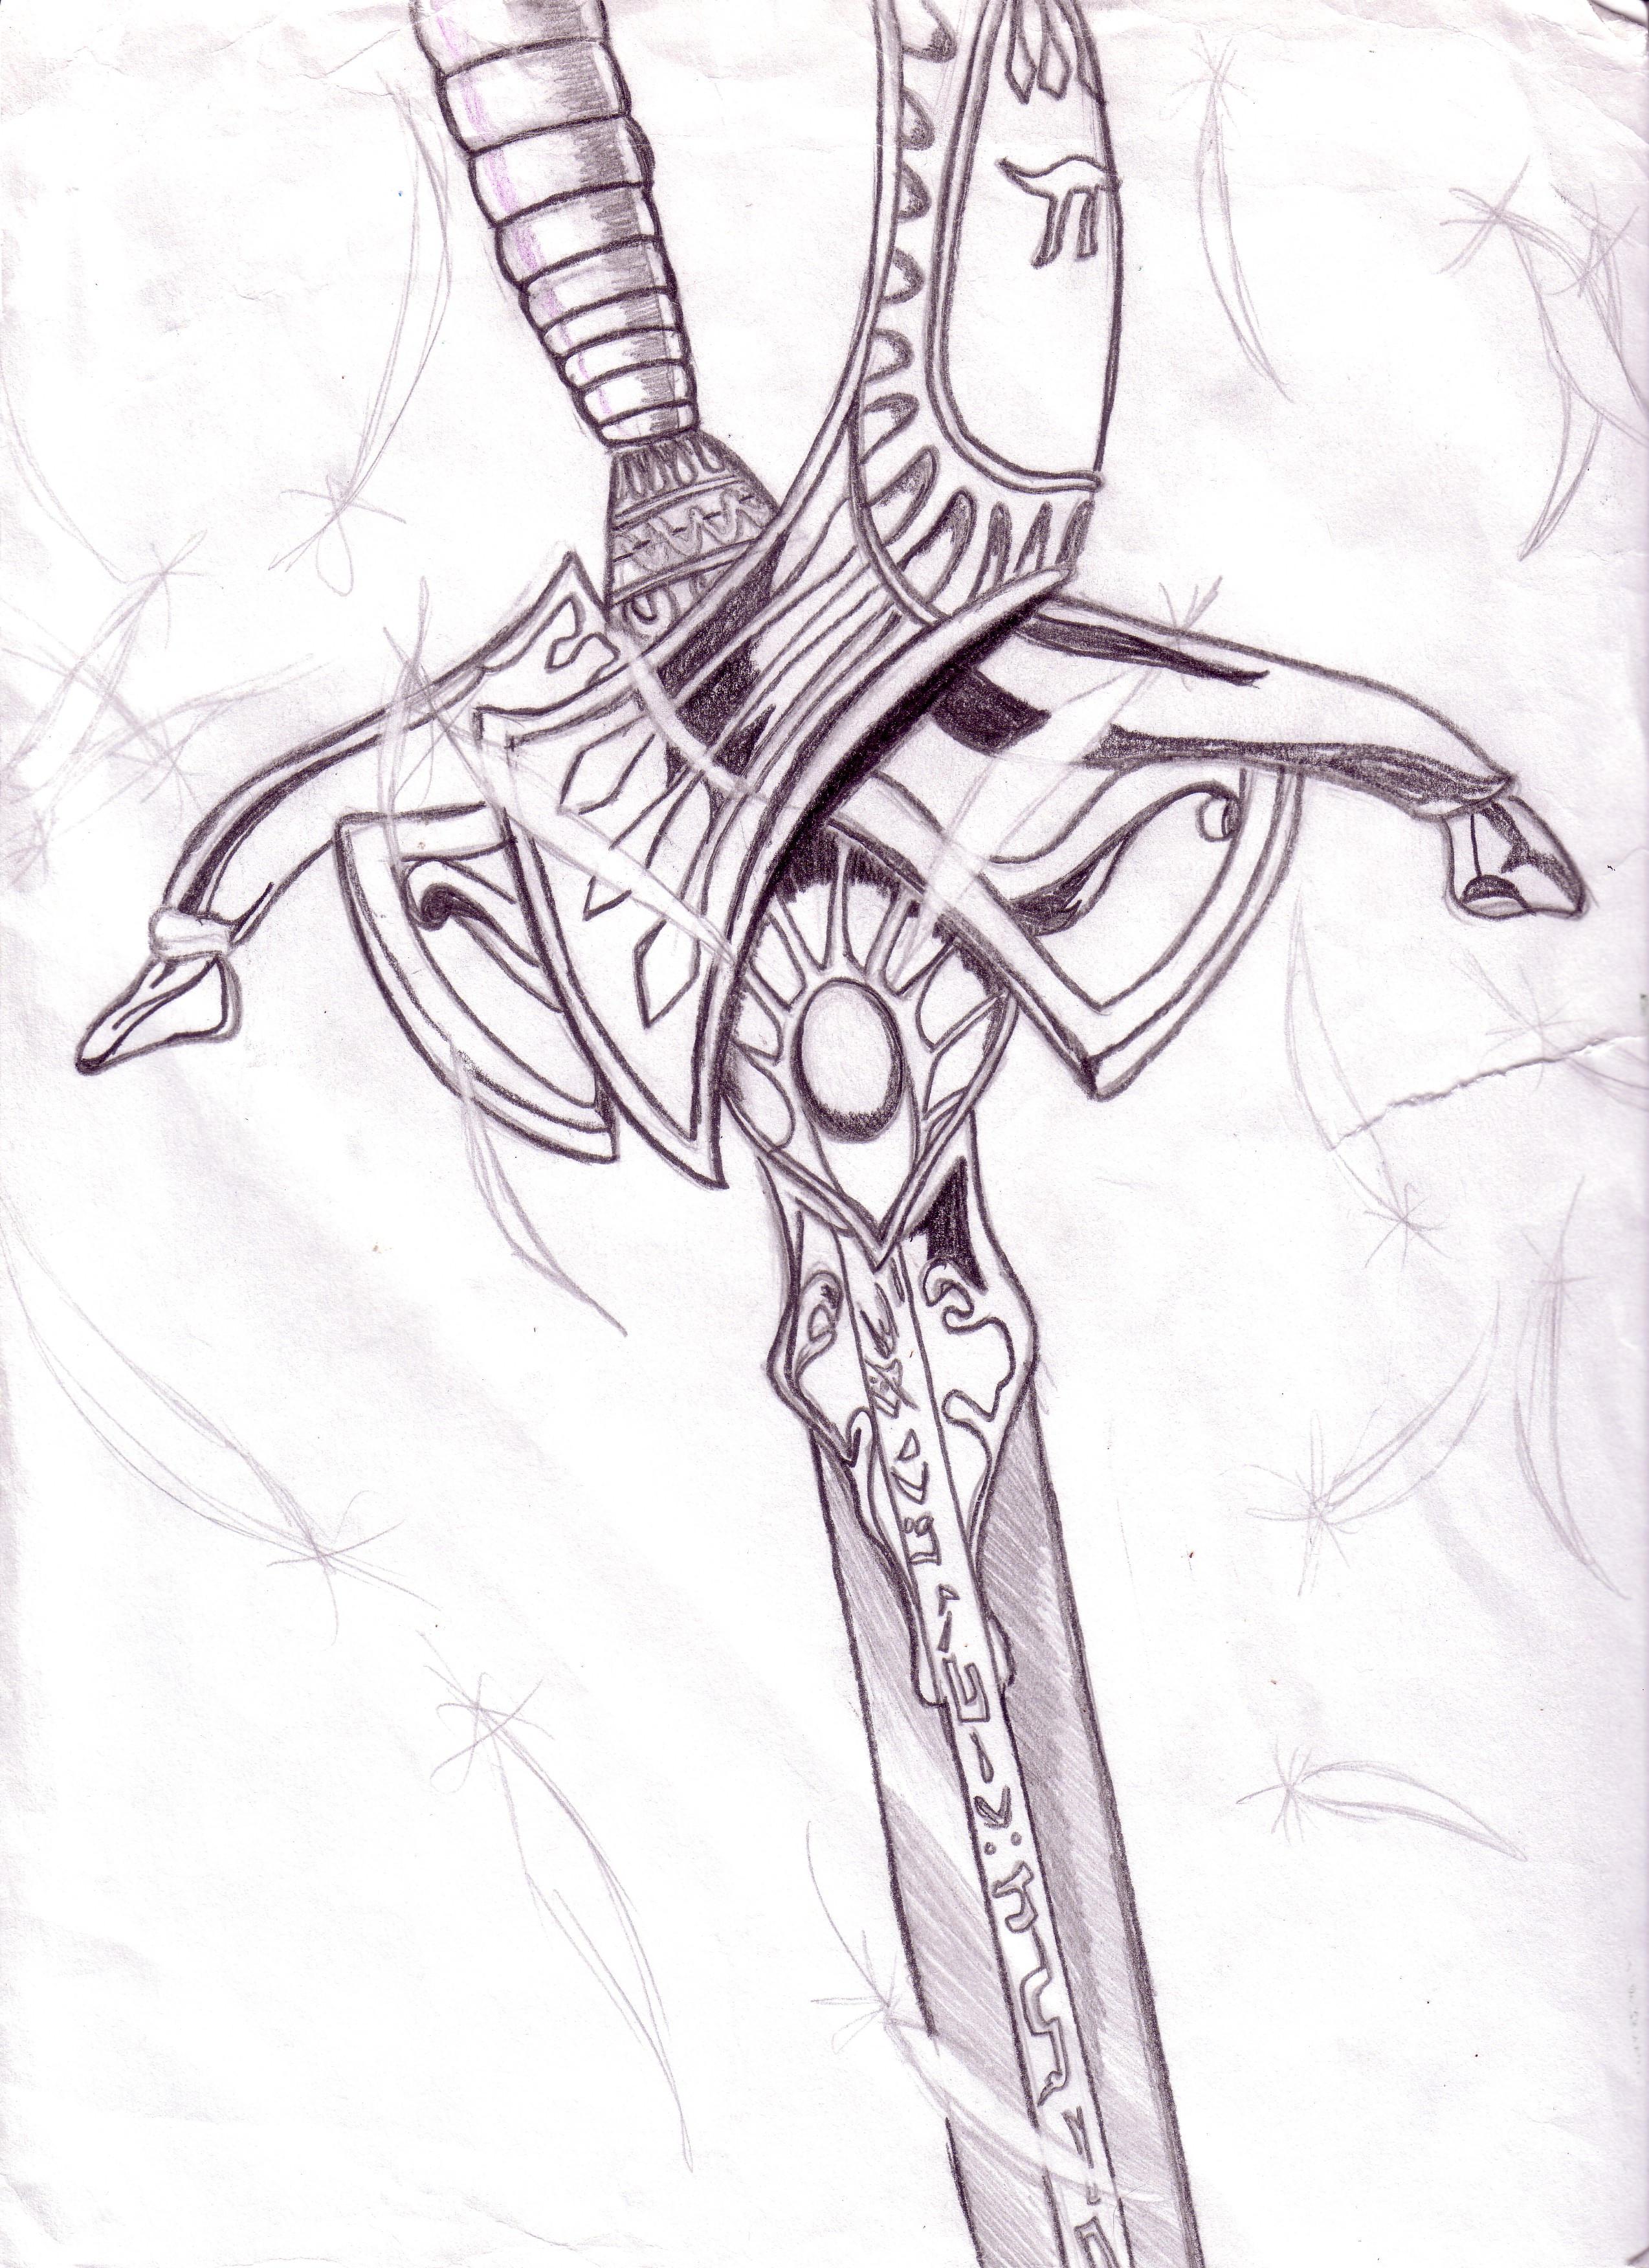 Shinken-Sword by kawaii-lil-taiga on DeviantArt